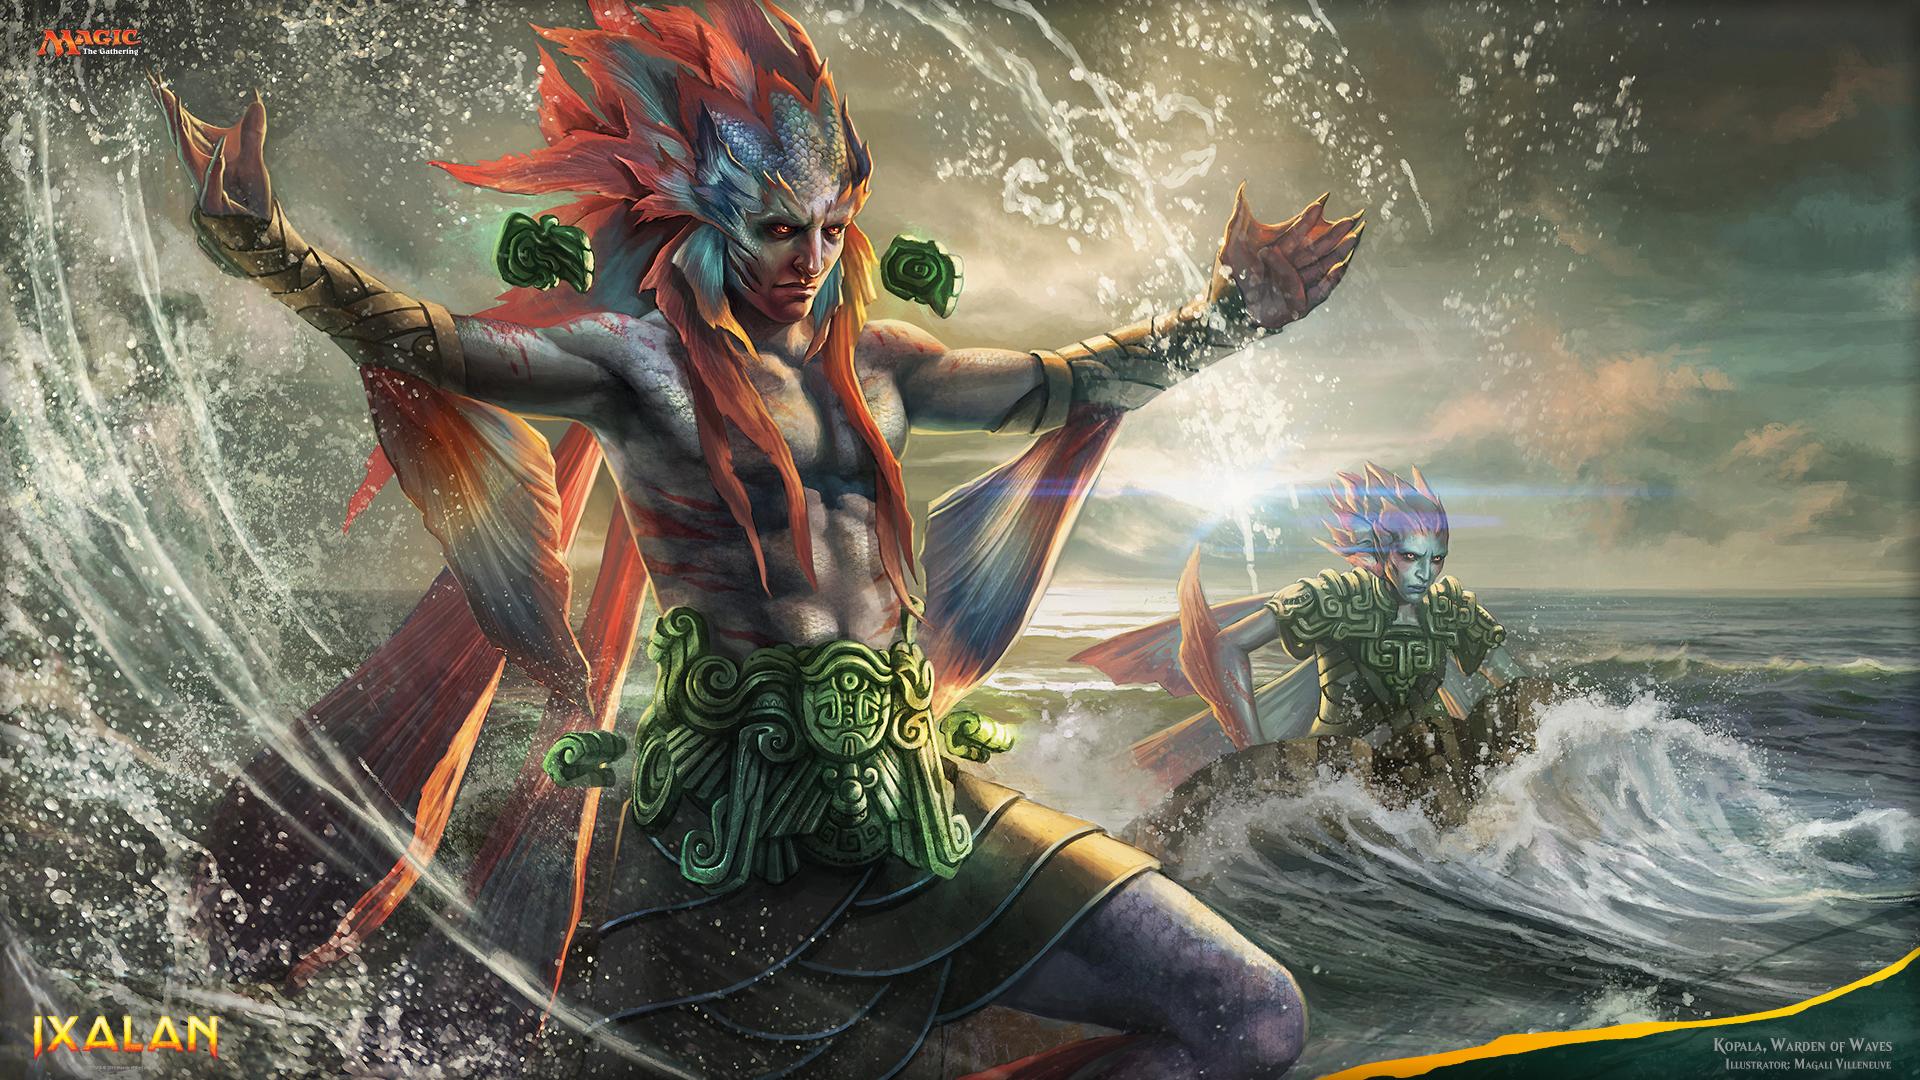 Ixalan Magic The Gathering Kopala Magic The Gathering Merfolk Magic The Gathering Warden Of Waves Wi 1920x1080